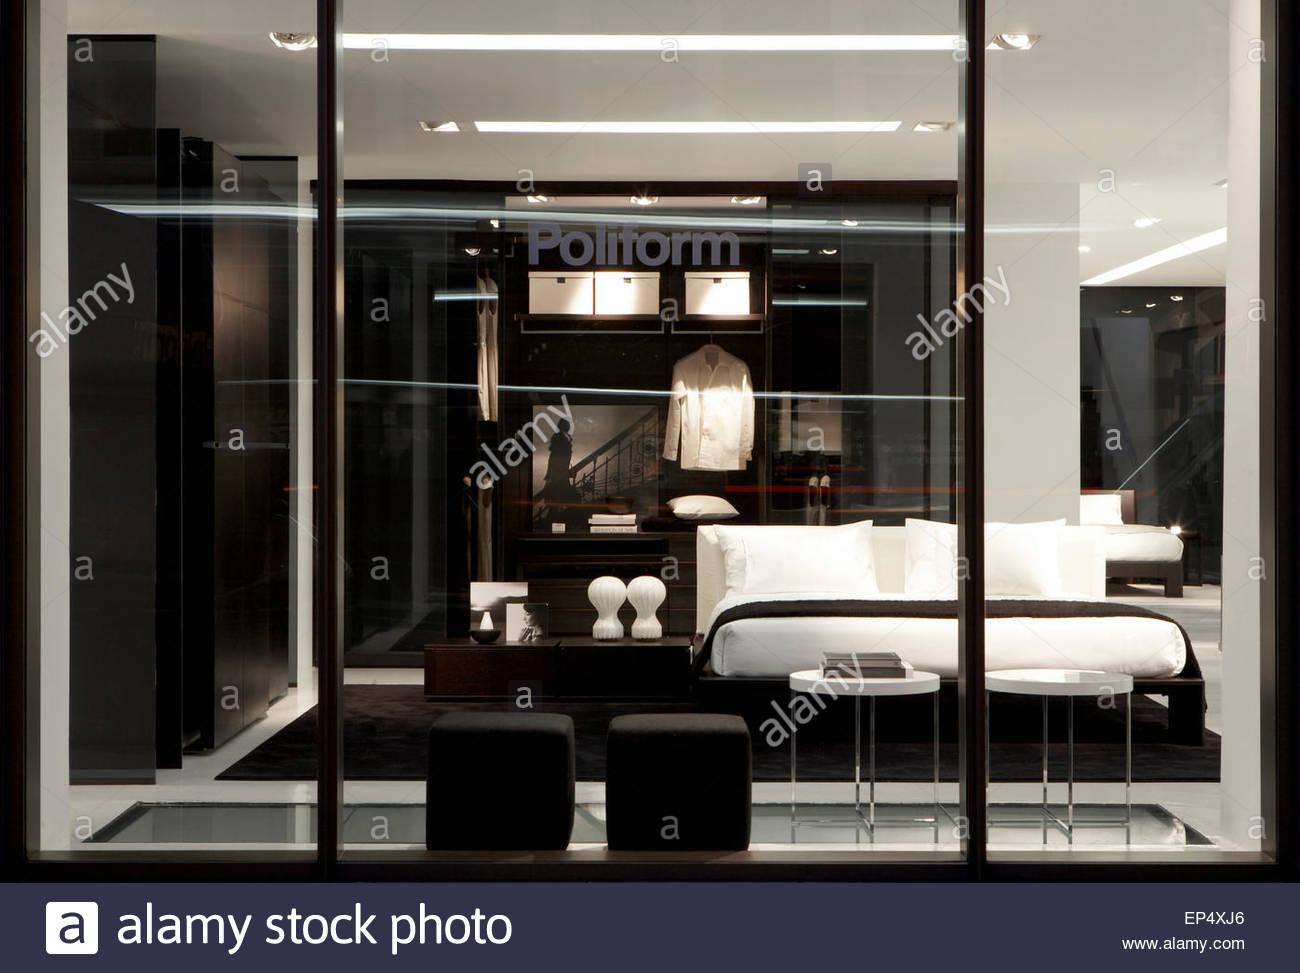 Display windows detail poliform showroom london london - Poliform showroom ...